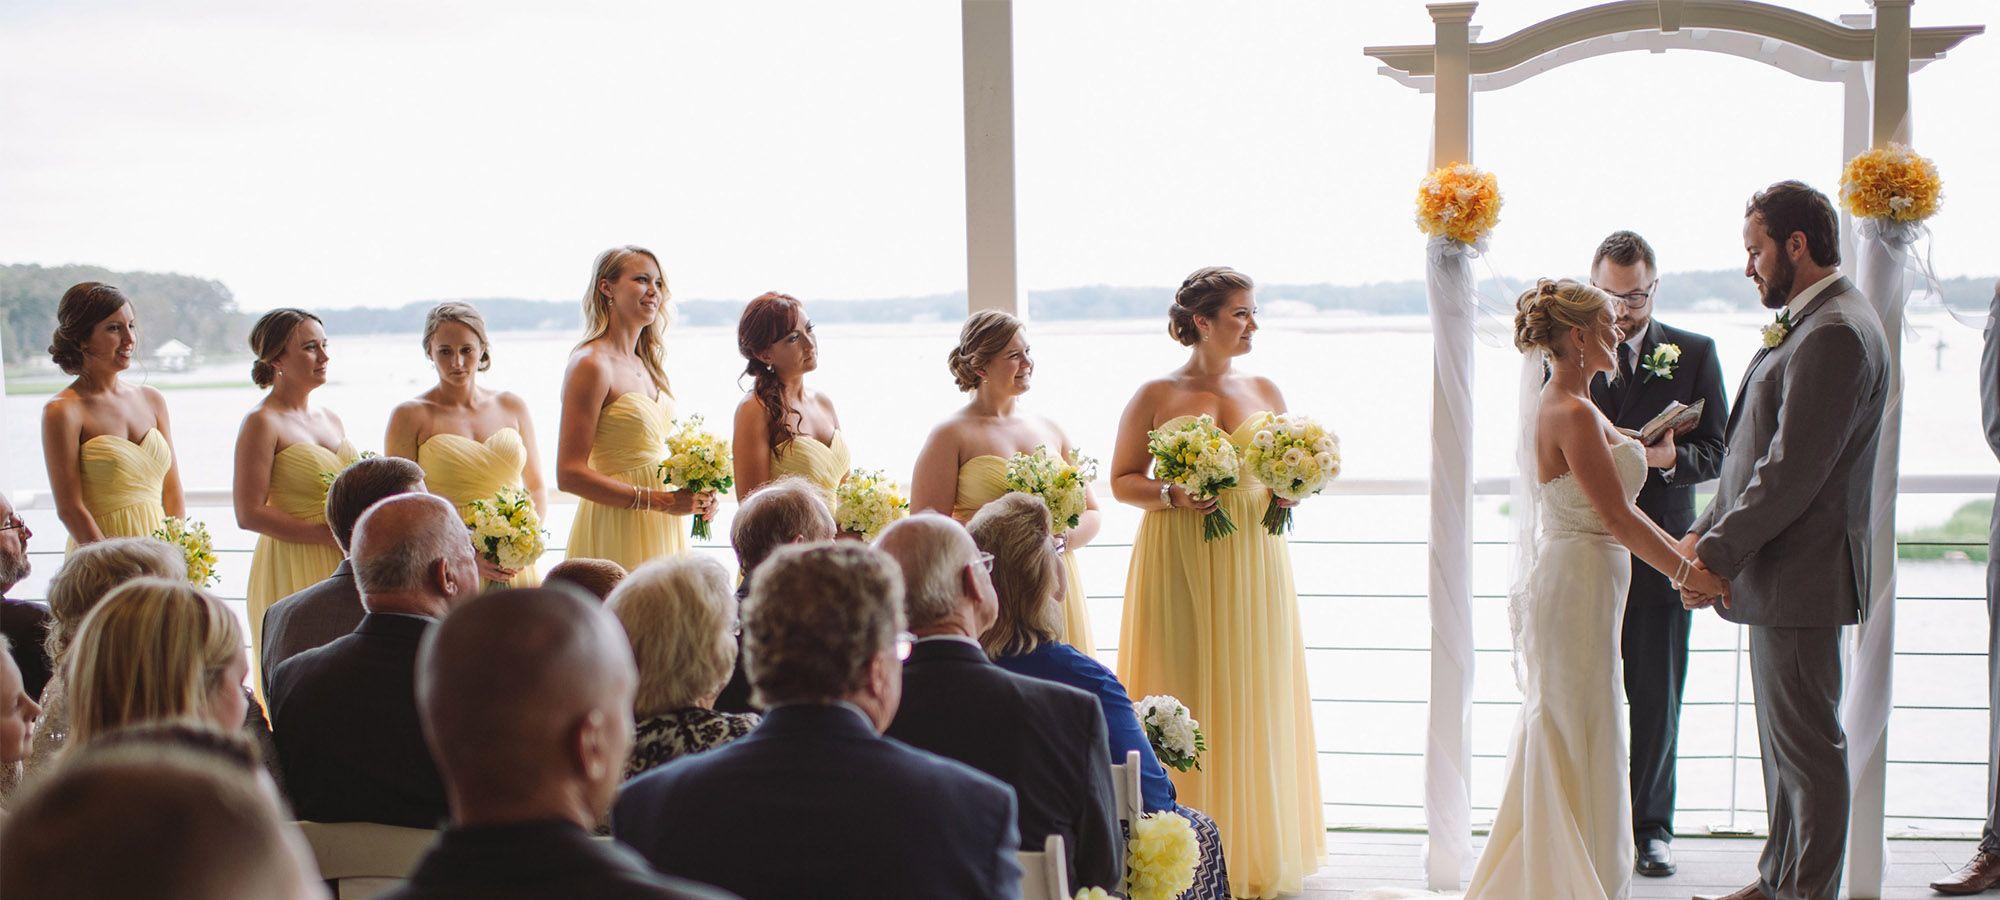 The Lesner InnBeautiful Views Of Virginia Beach Coastal Waterways For Both Ceremonies Receptions Waterfront WeddingCoastal